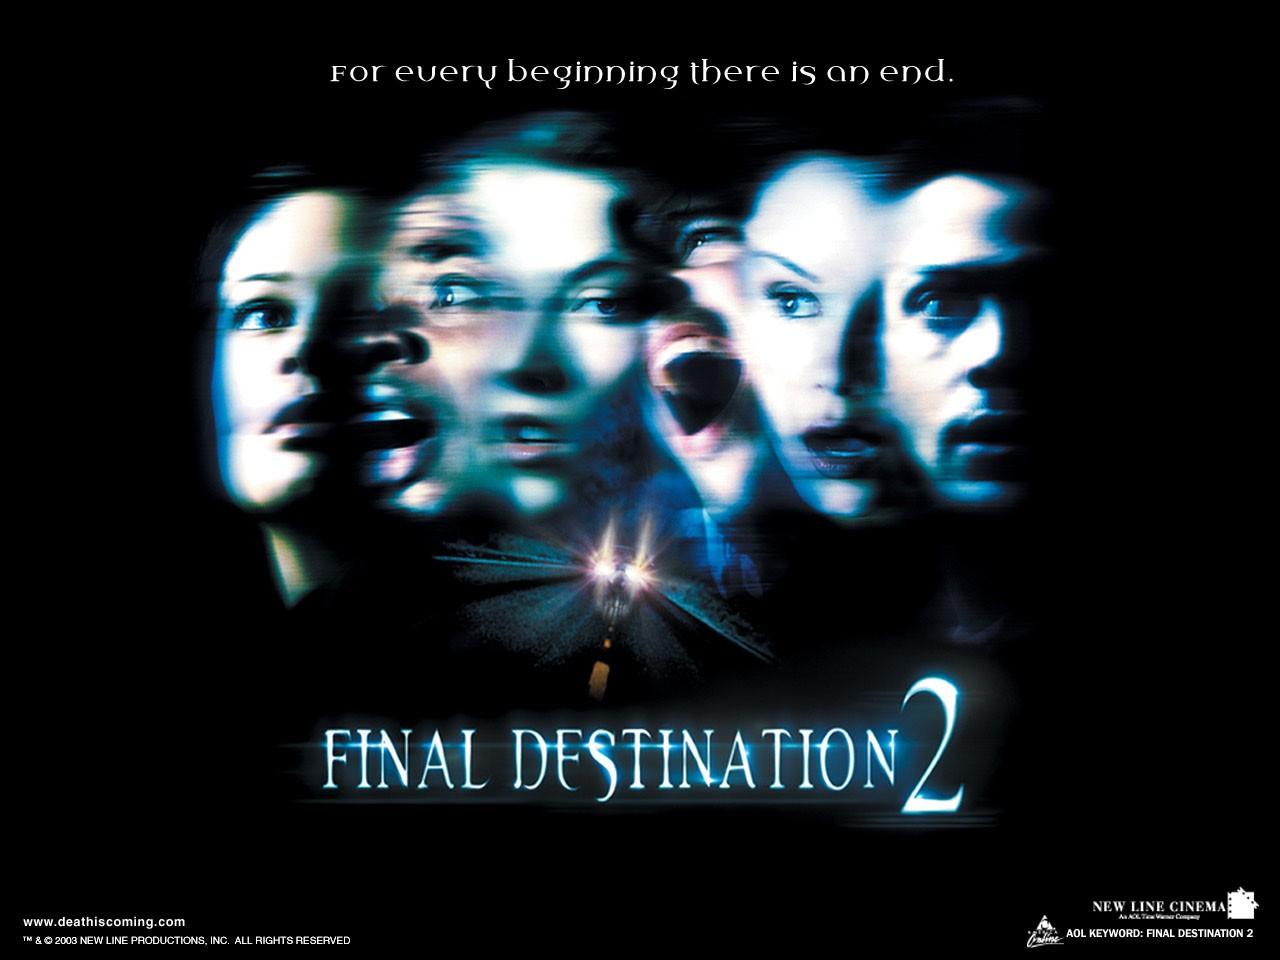 Un wallpaper ufficiale del film Final Destination 2